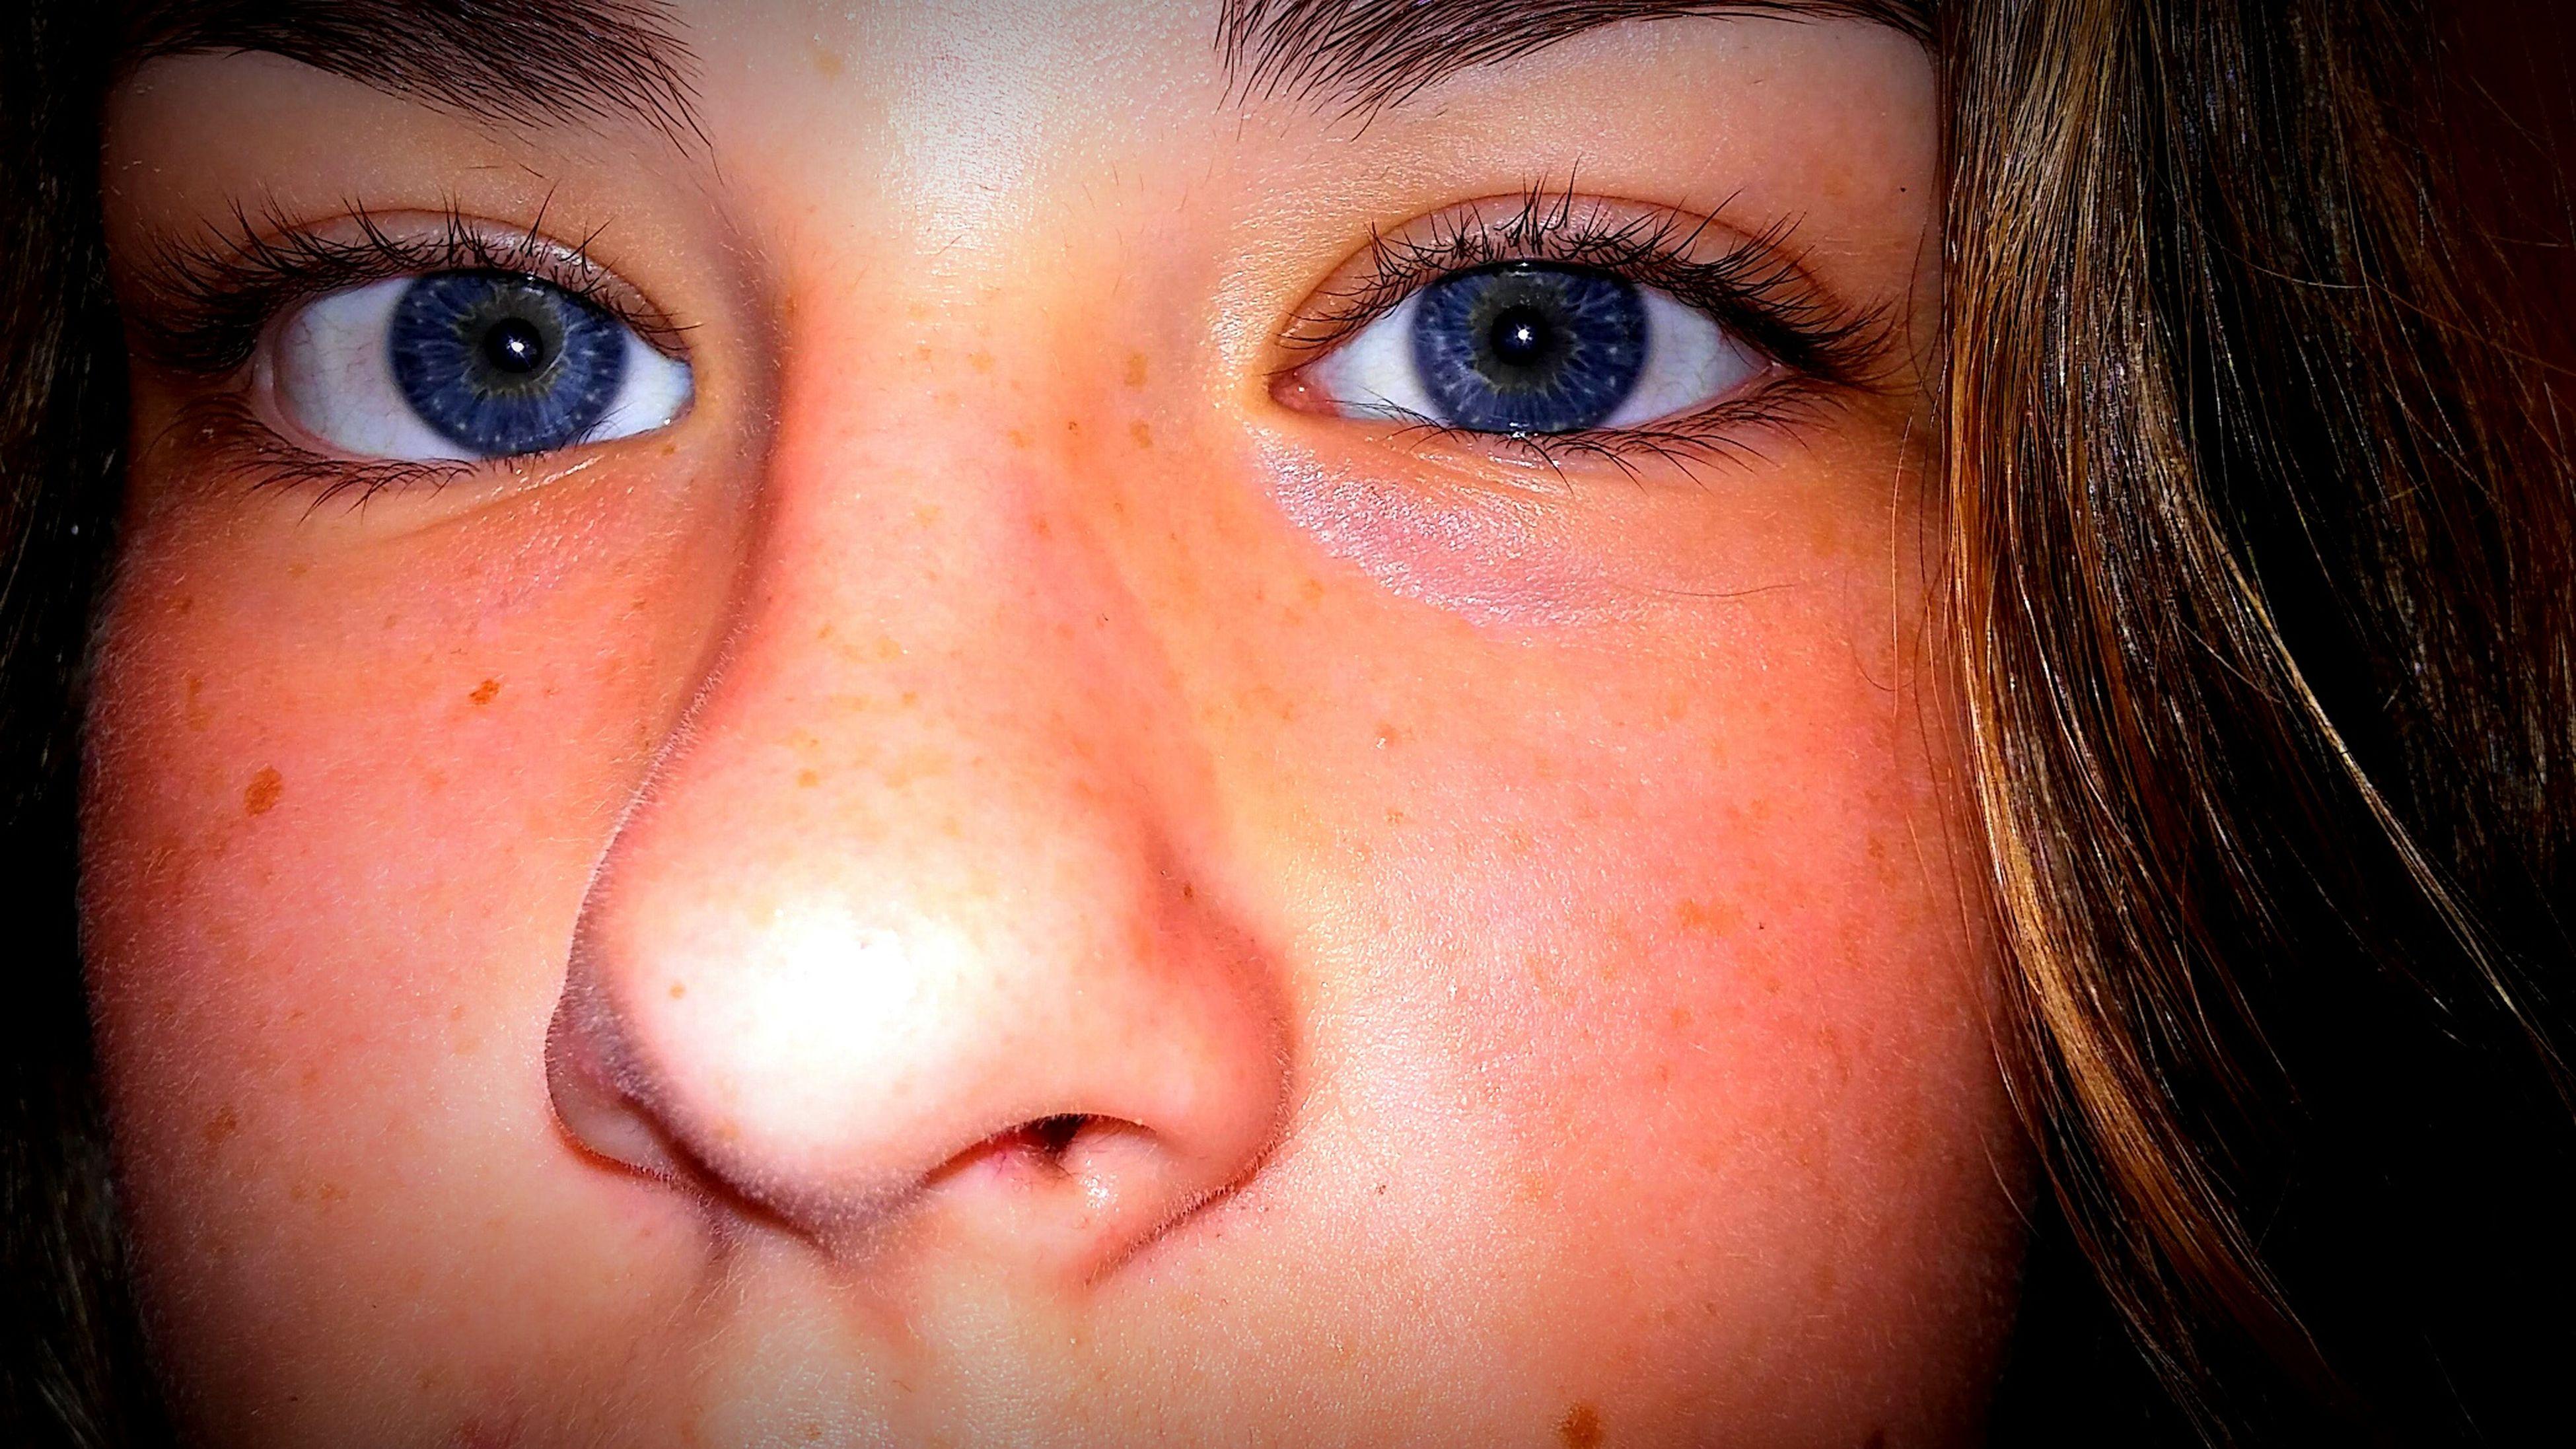 headshot, looking at camera, young women, young adult, close-up, person, full frame, human eye, human face, focus on foreground, make-up, beauty, eyelash, human skin